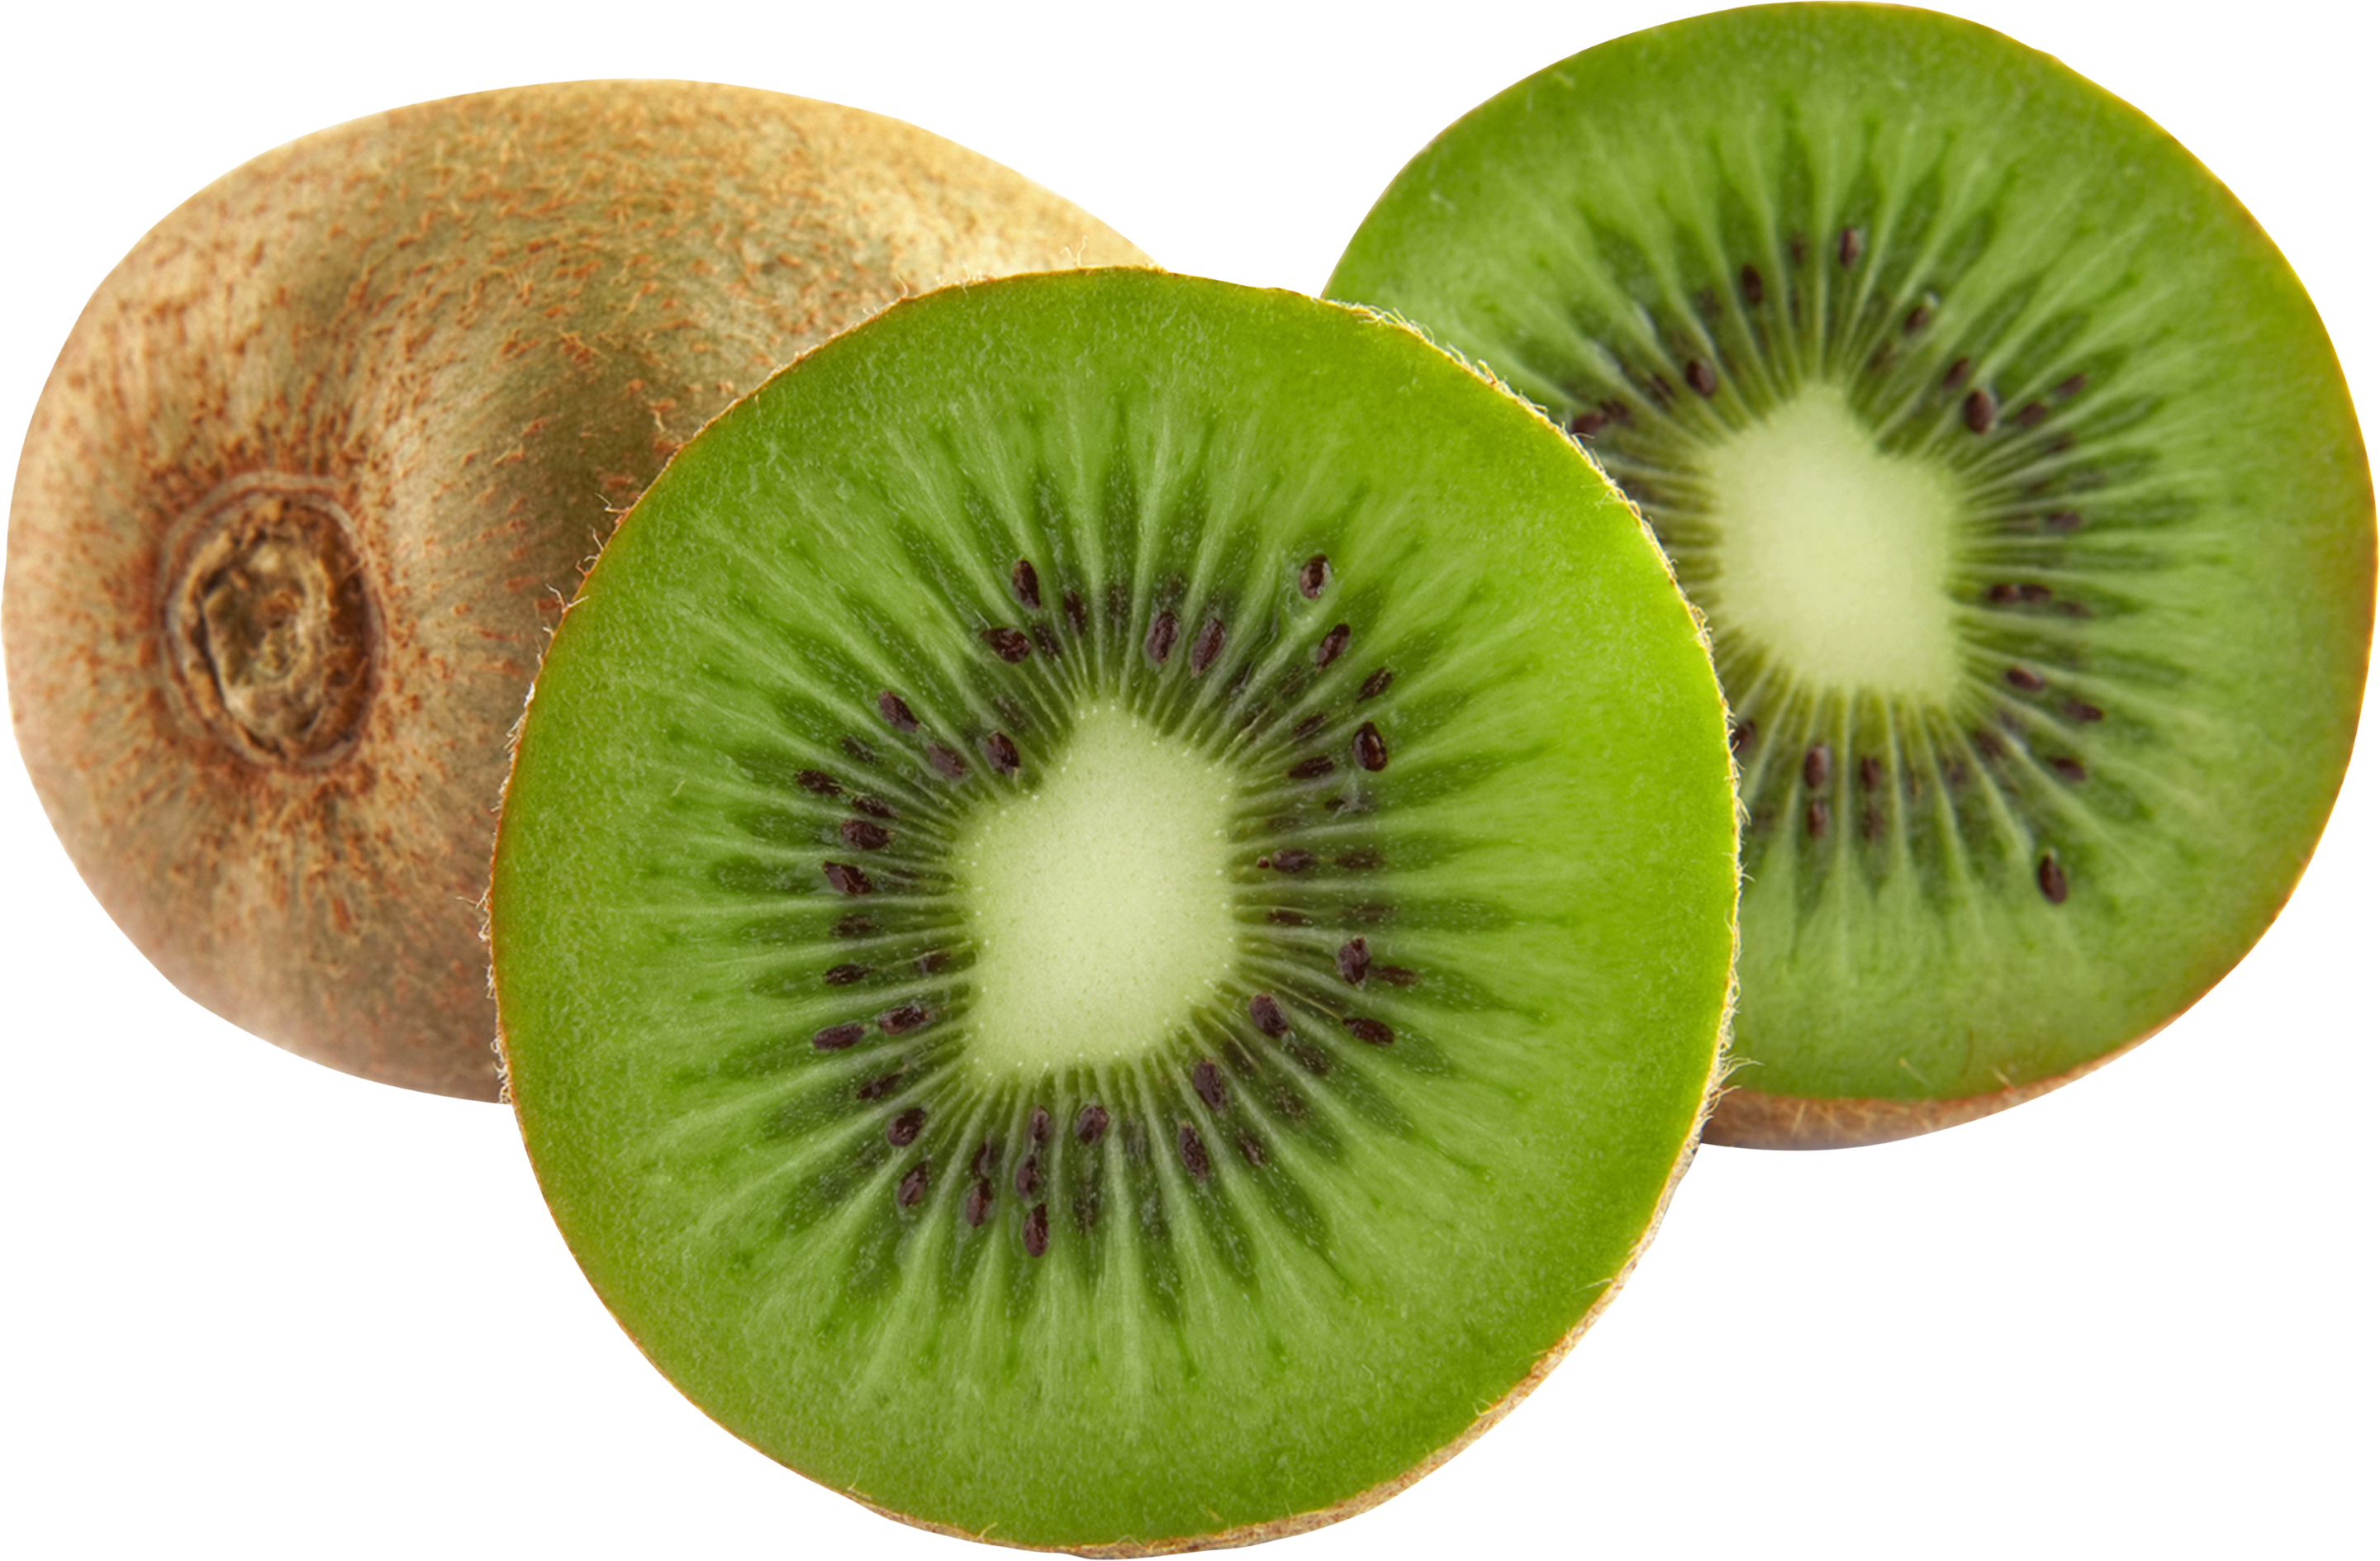 Green cutted kiwi PNG image - Kiwi PNG - Kiwi HD PNG